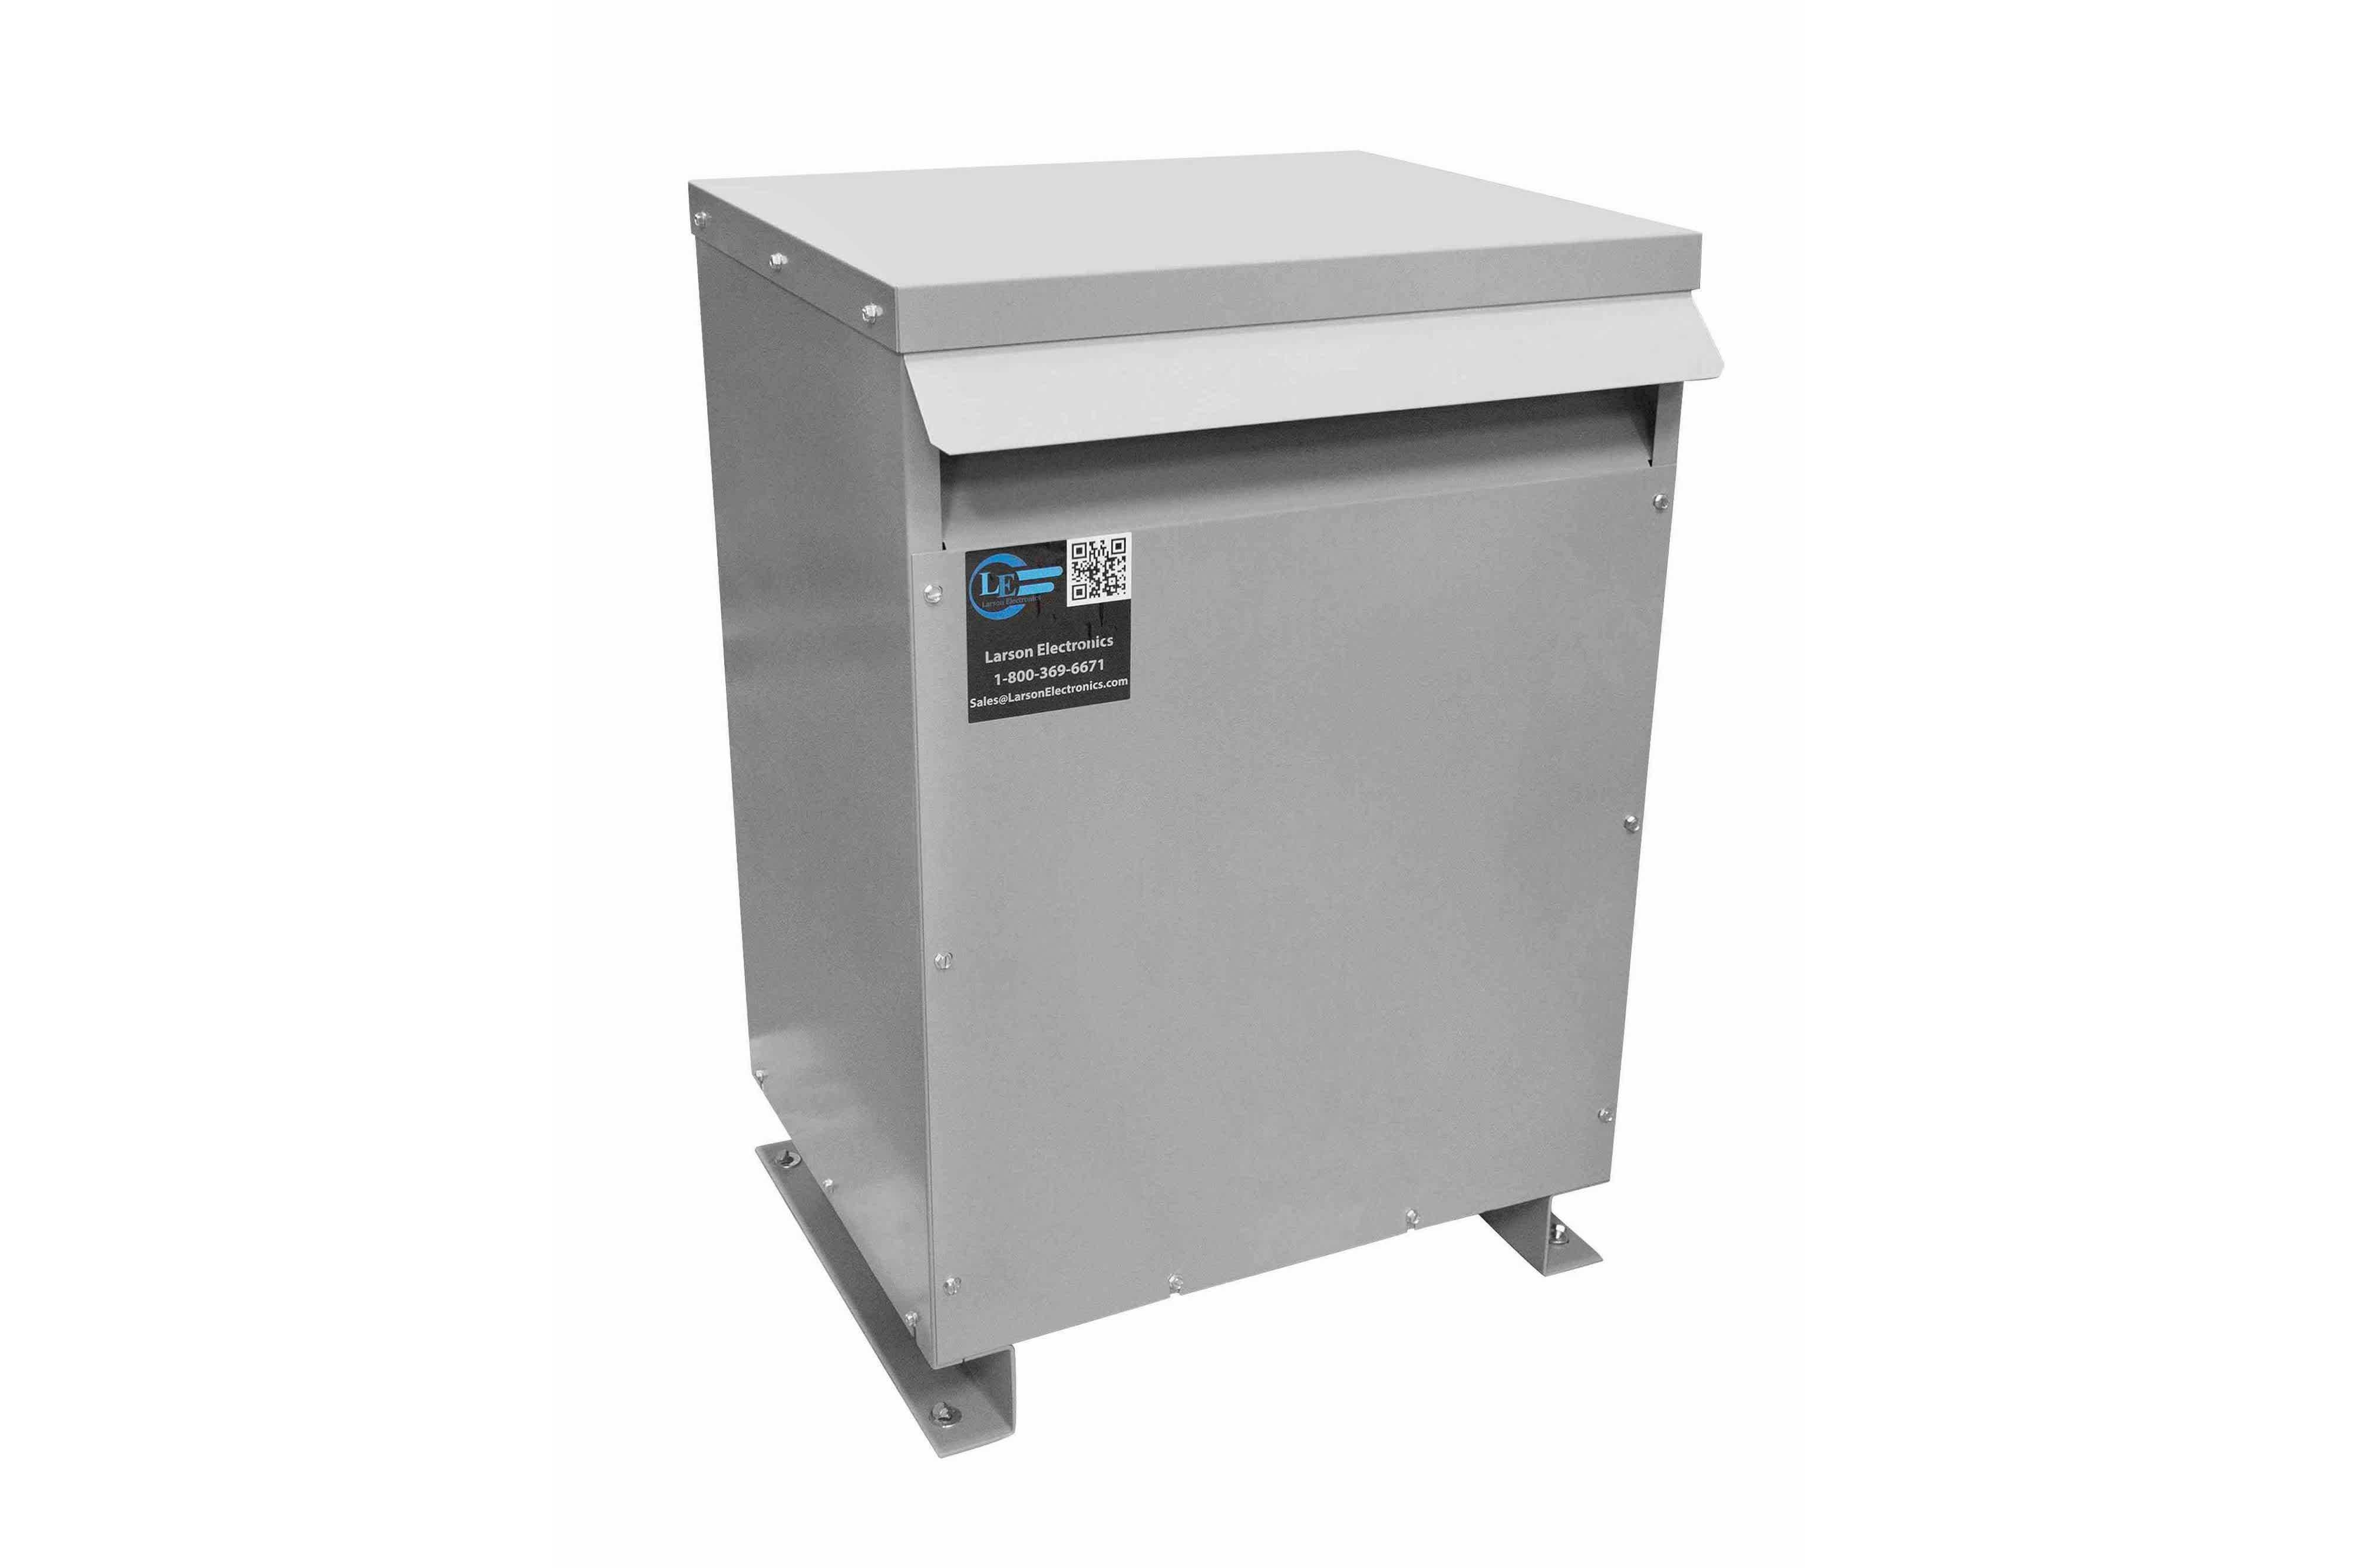 55 kVA 3PH Isolation Transformer, 600V Wye Primary, 240V Delta Secondary, N3R, Ventilated, 60 Hz